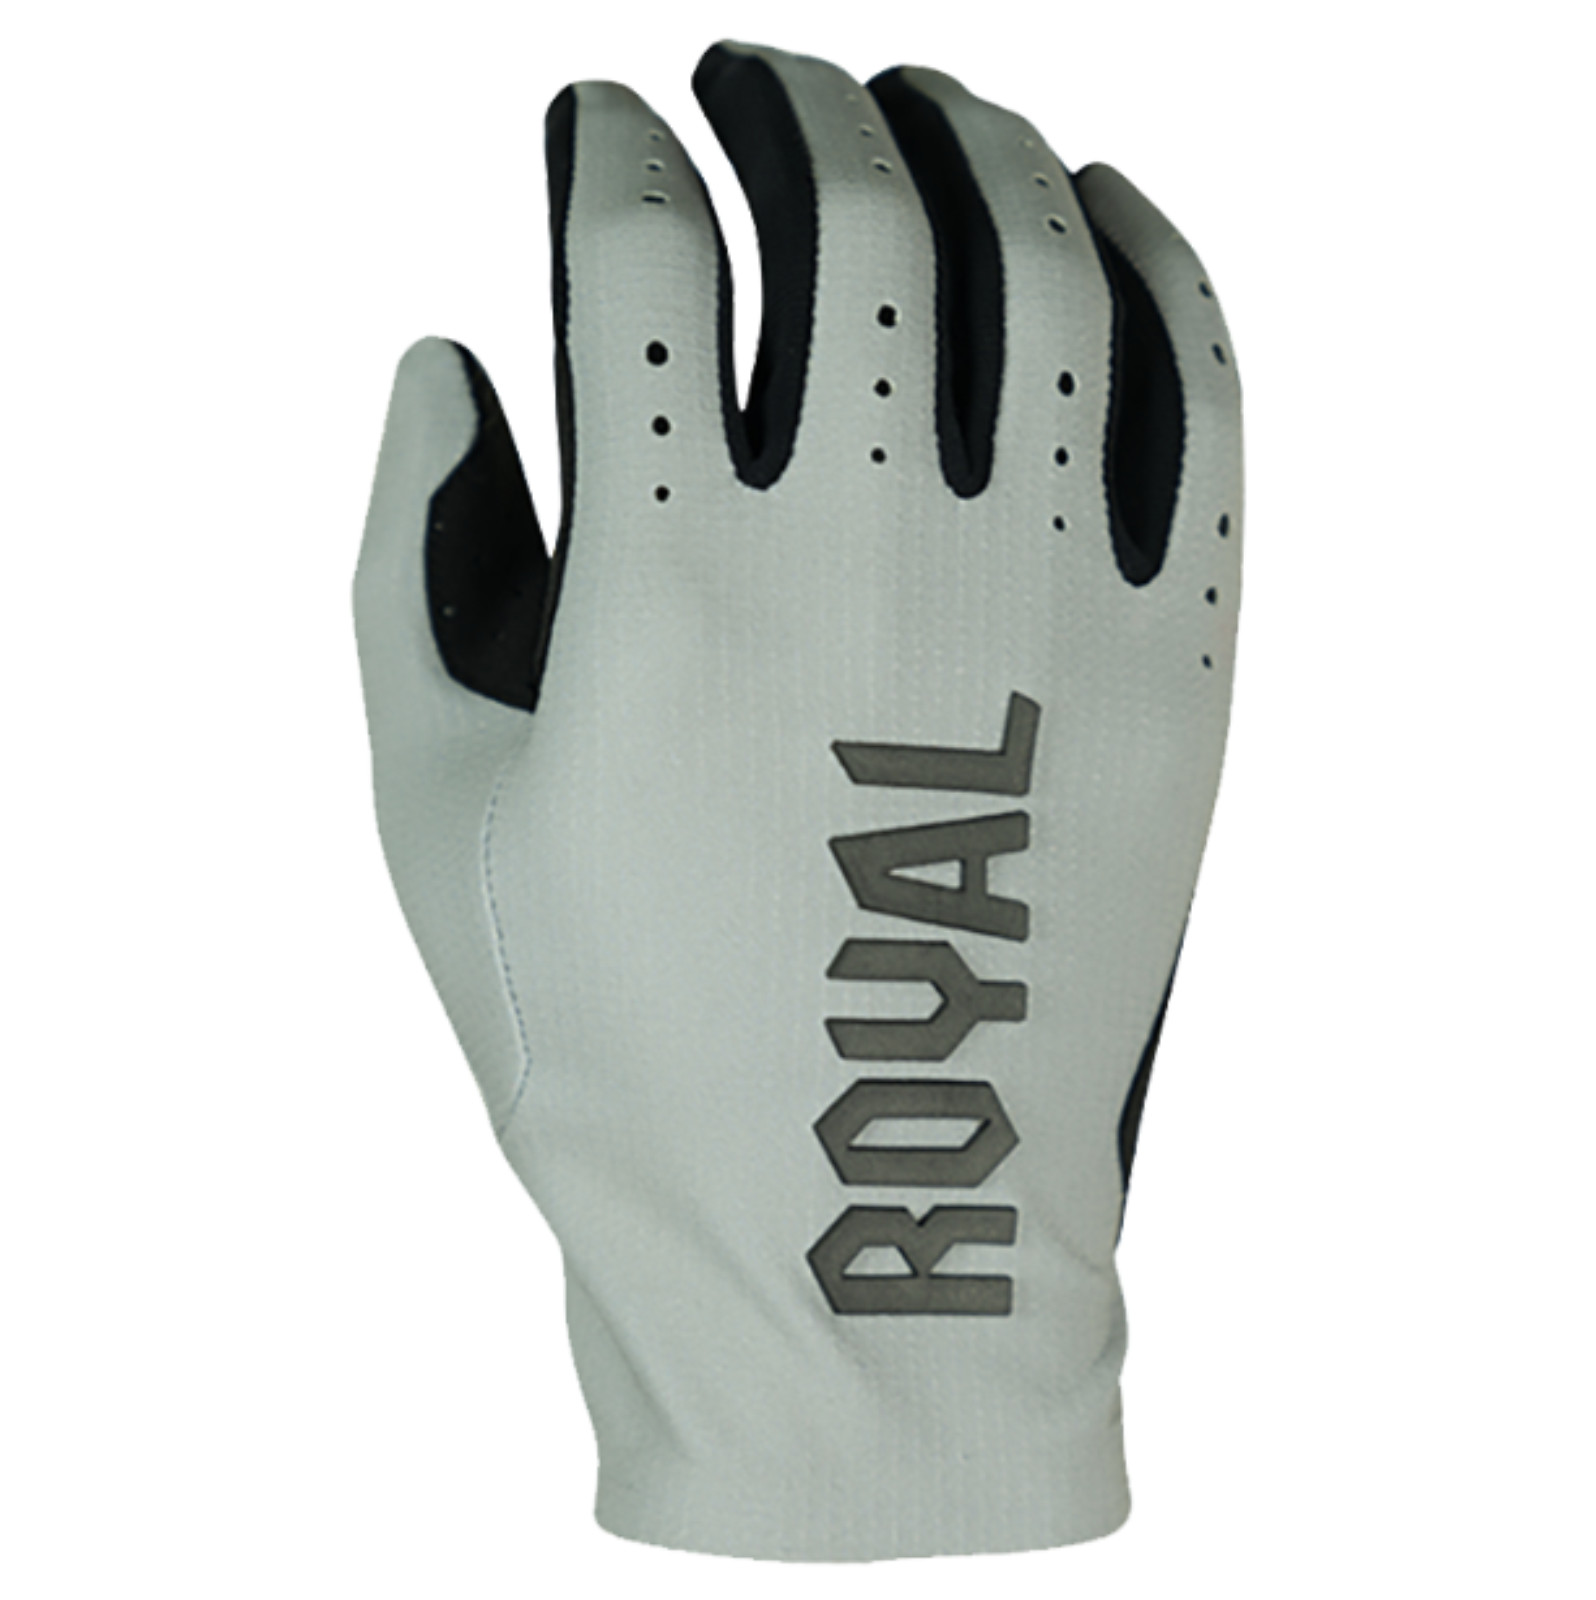 Royal 2020 Race Gloves - Grey